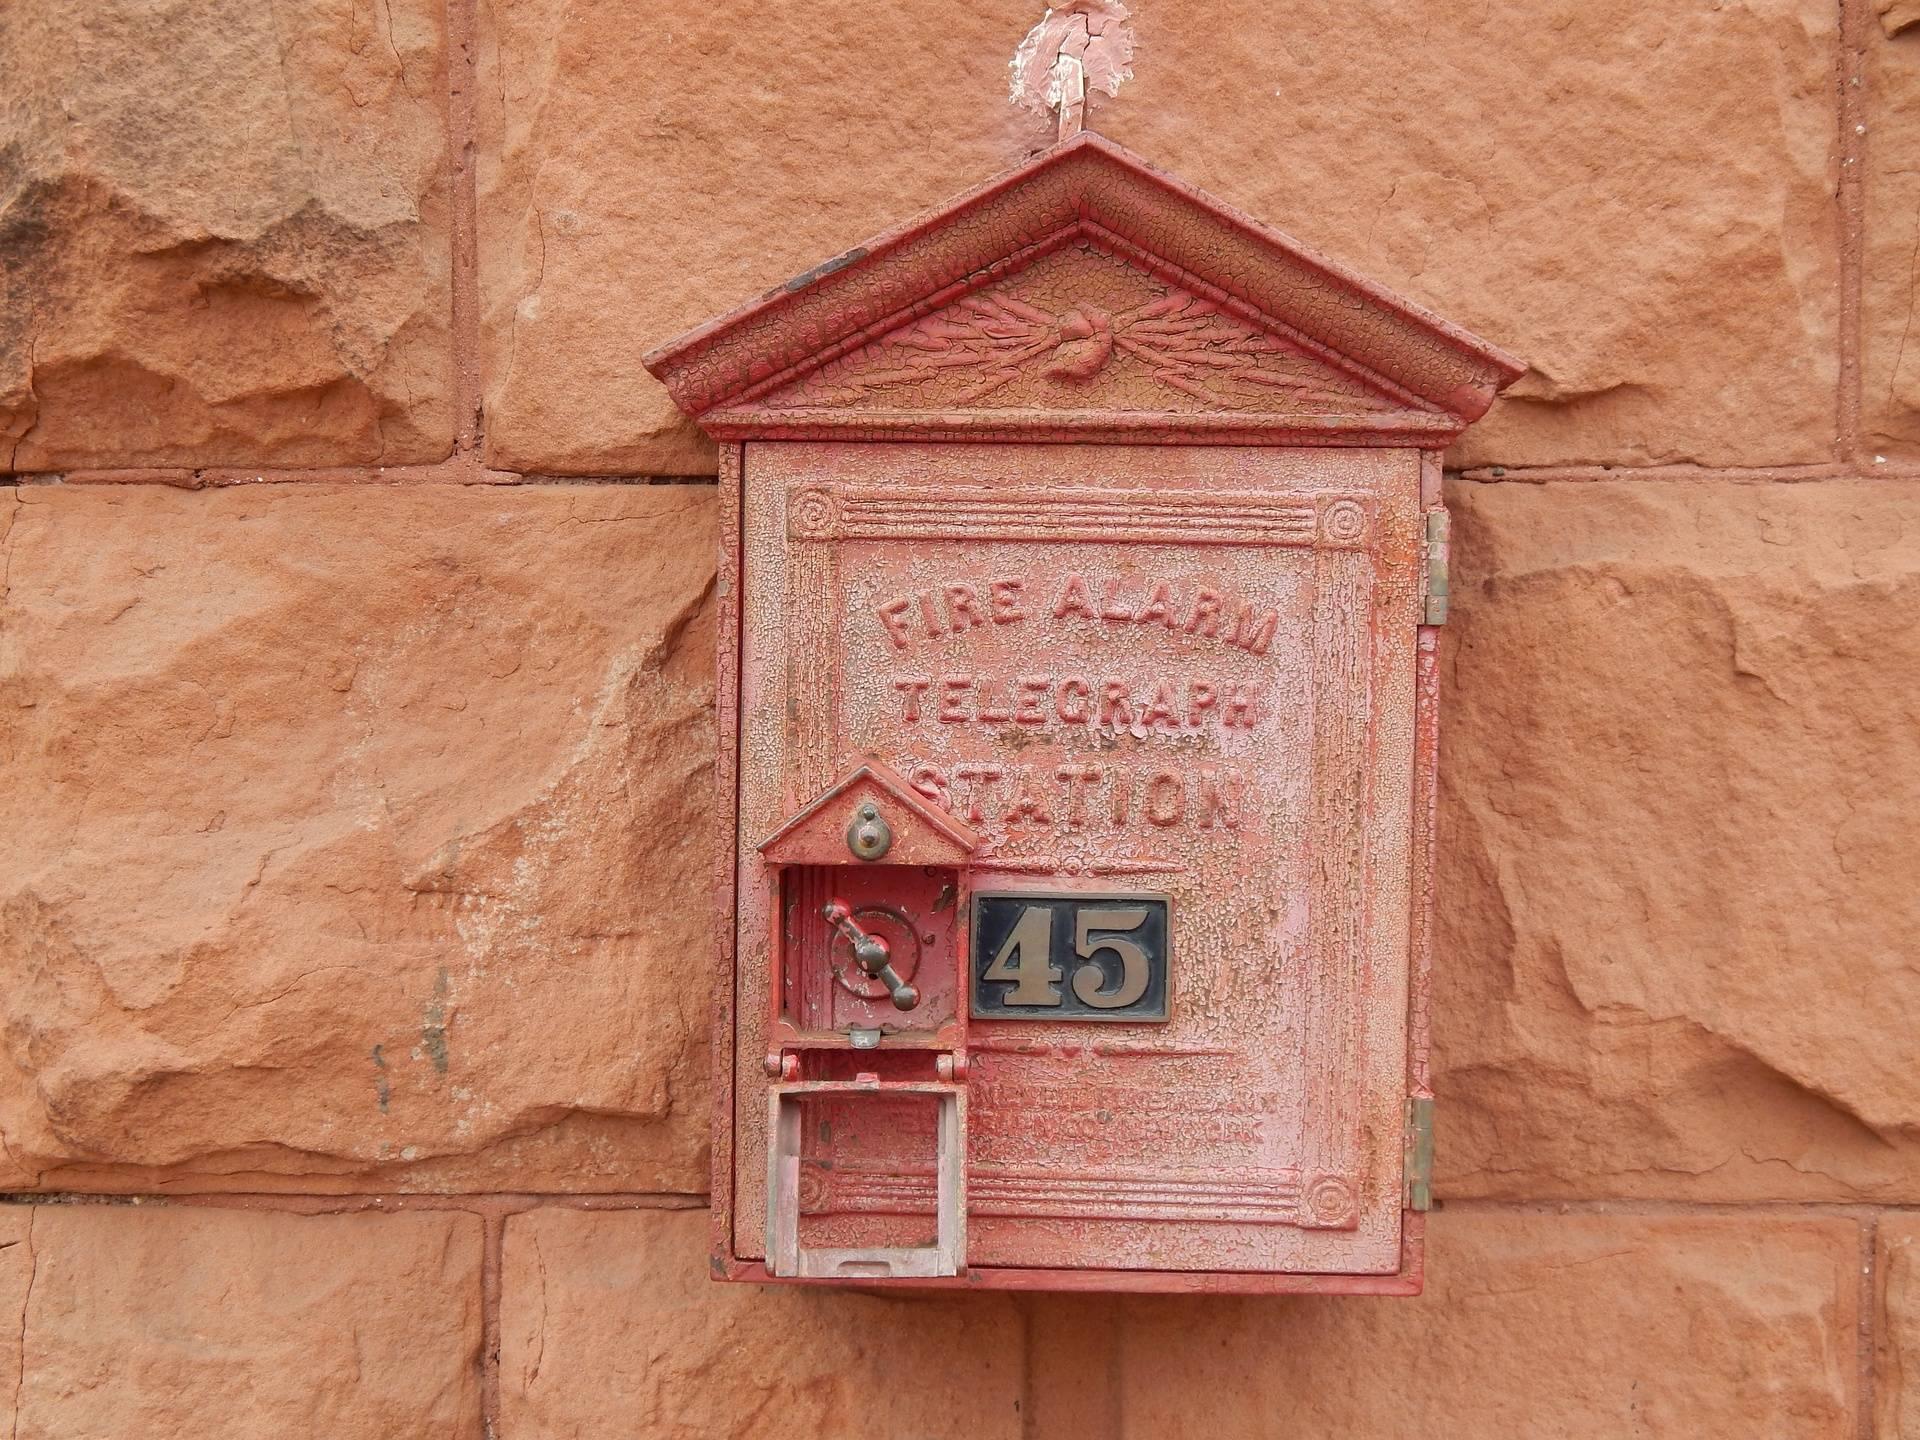 Fire Alarm Box # 45